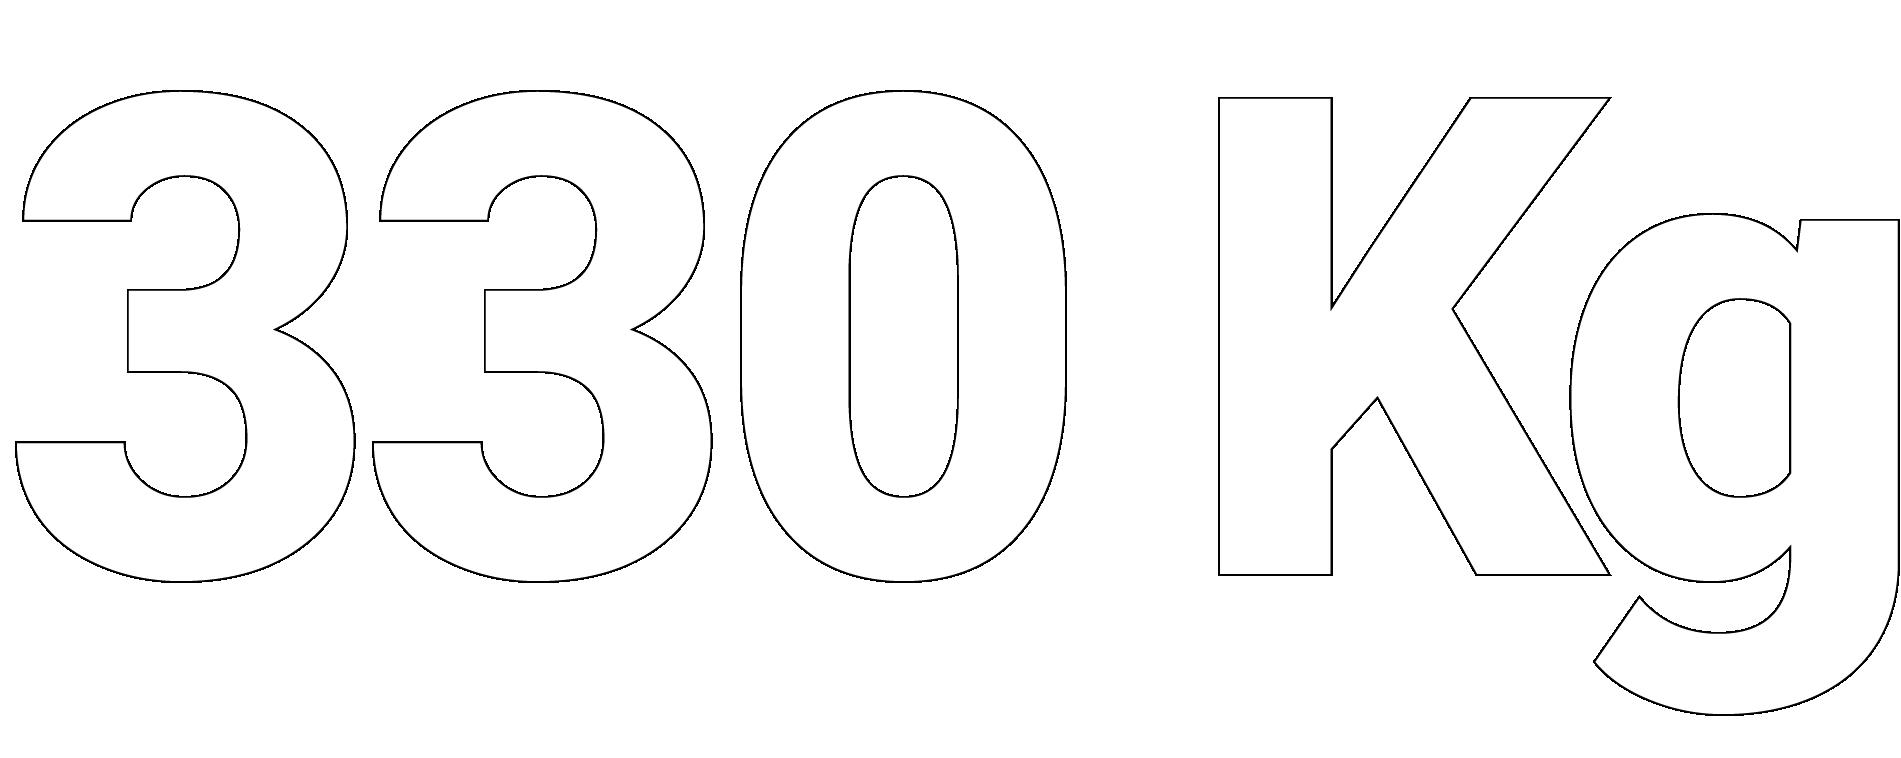 330 kg